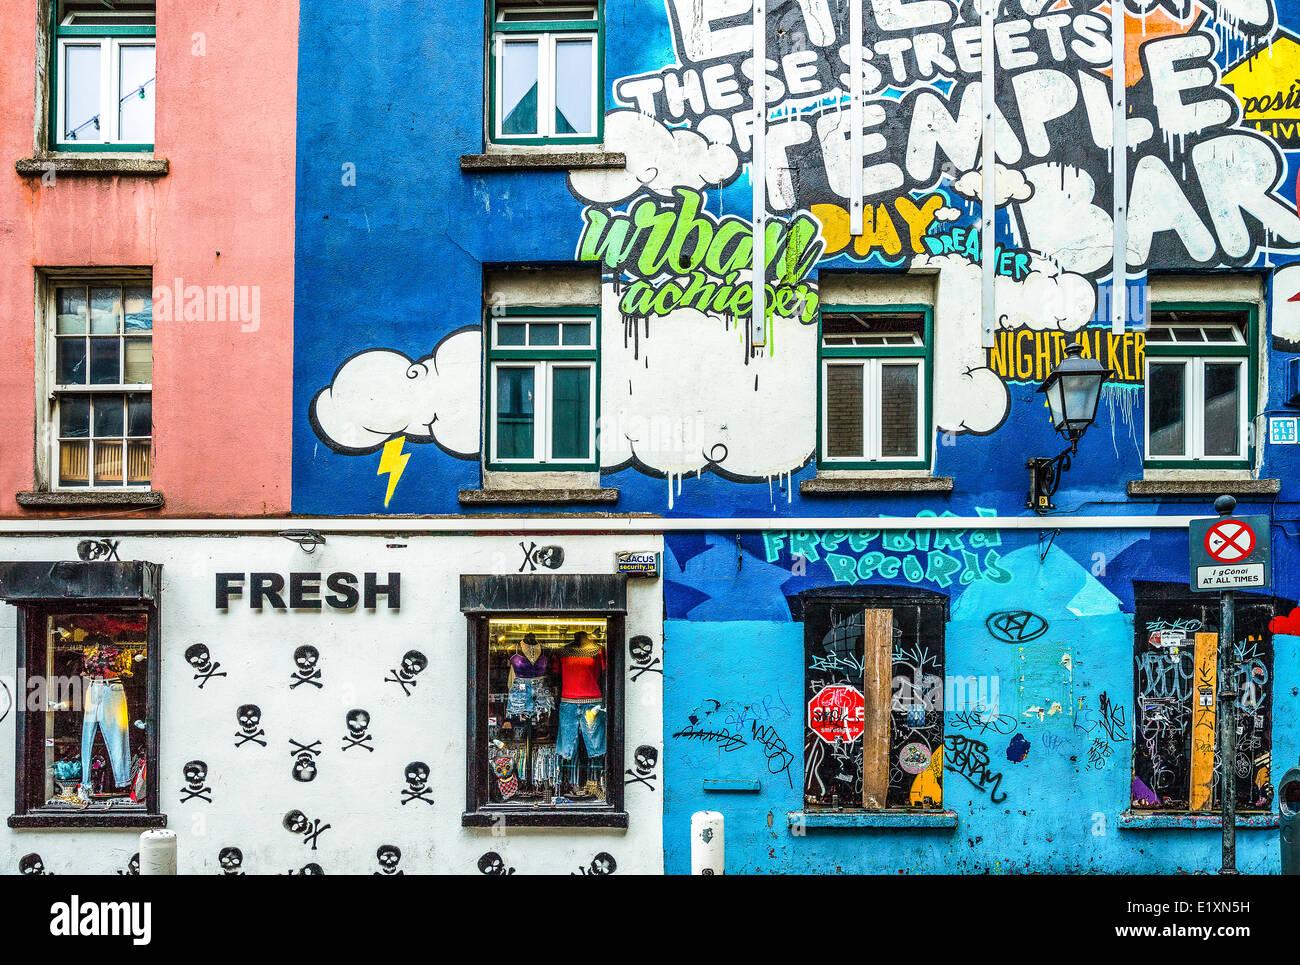 Ireland, Dublin, shops of the Temple Bar quarter - Stock Image